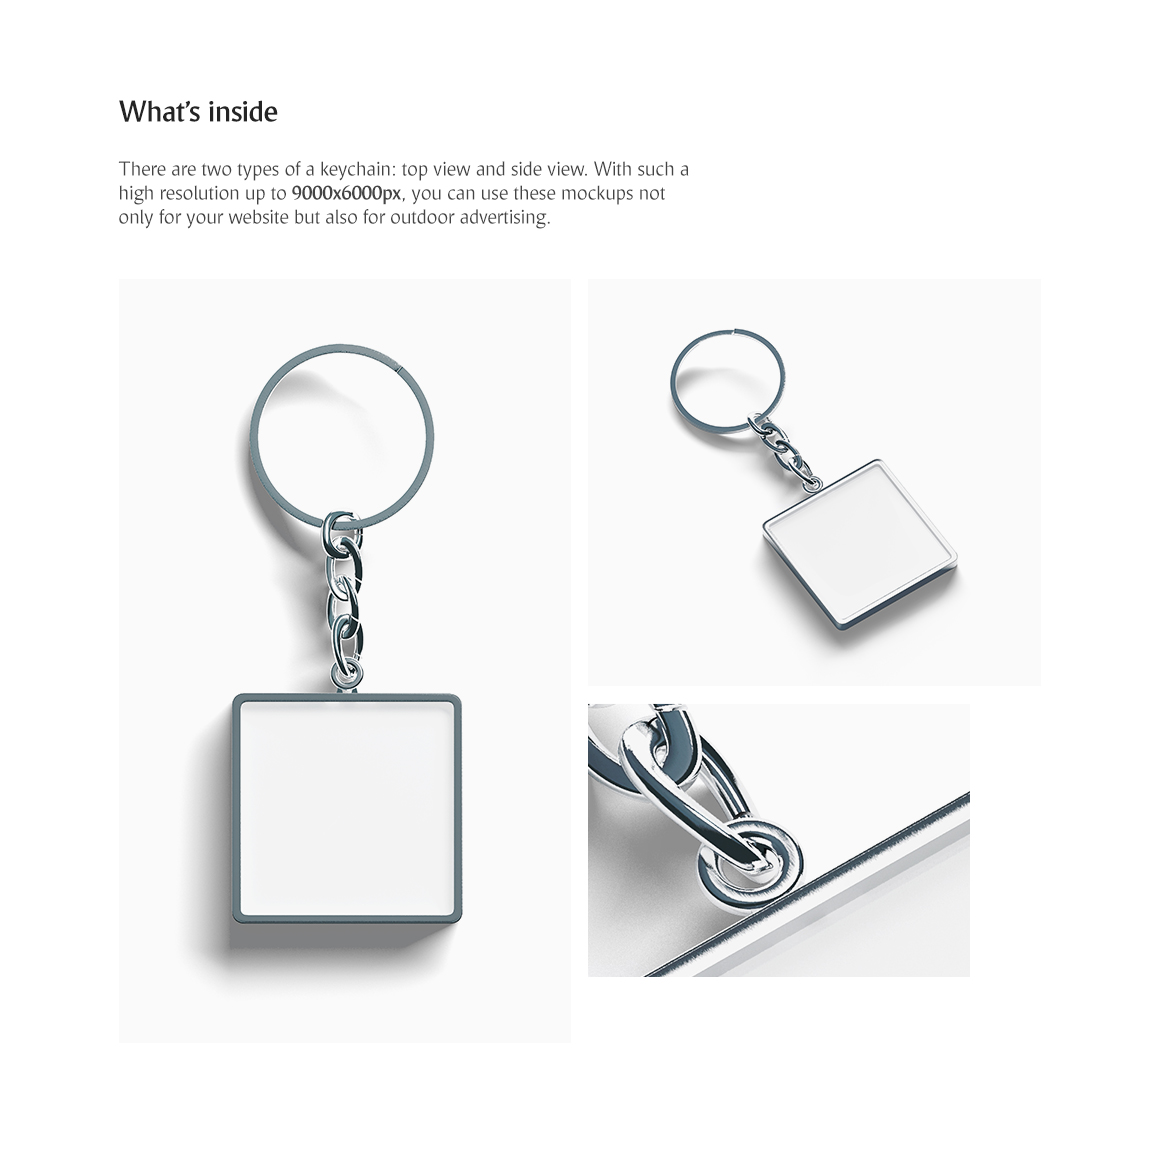 Square Keychain Mockup example image 2